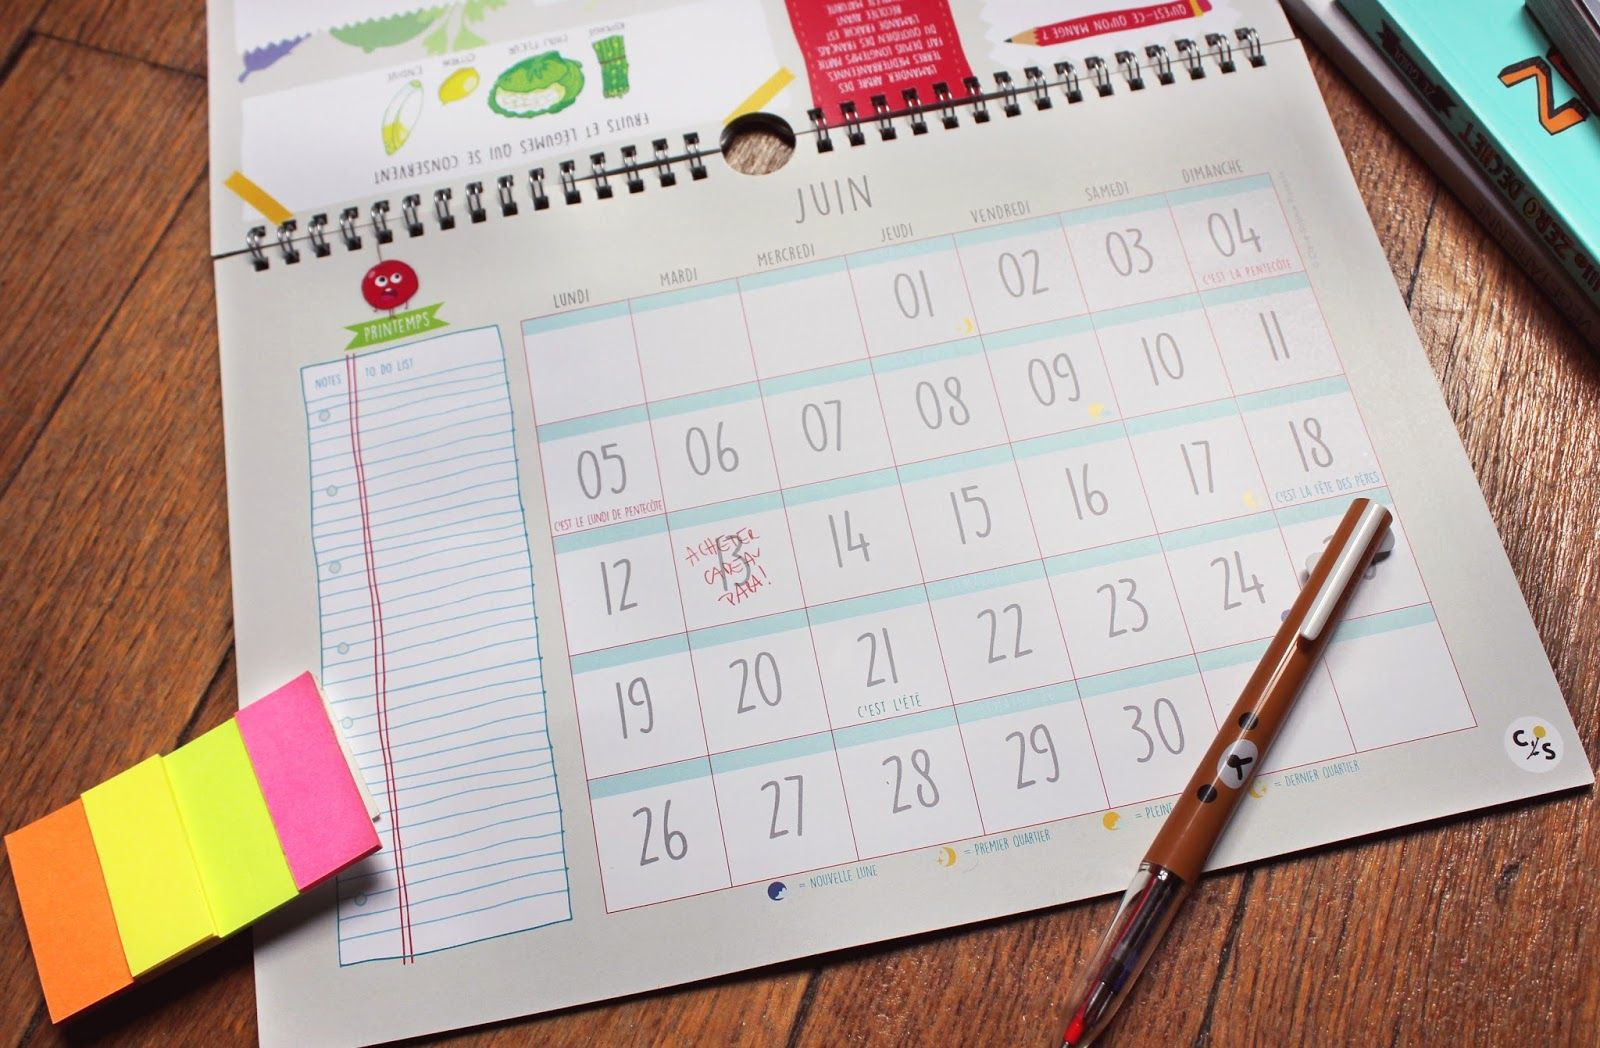 le calendrier illustr u00e9 2017 des fruits et l u00e9gumes de